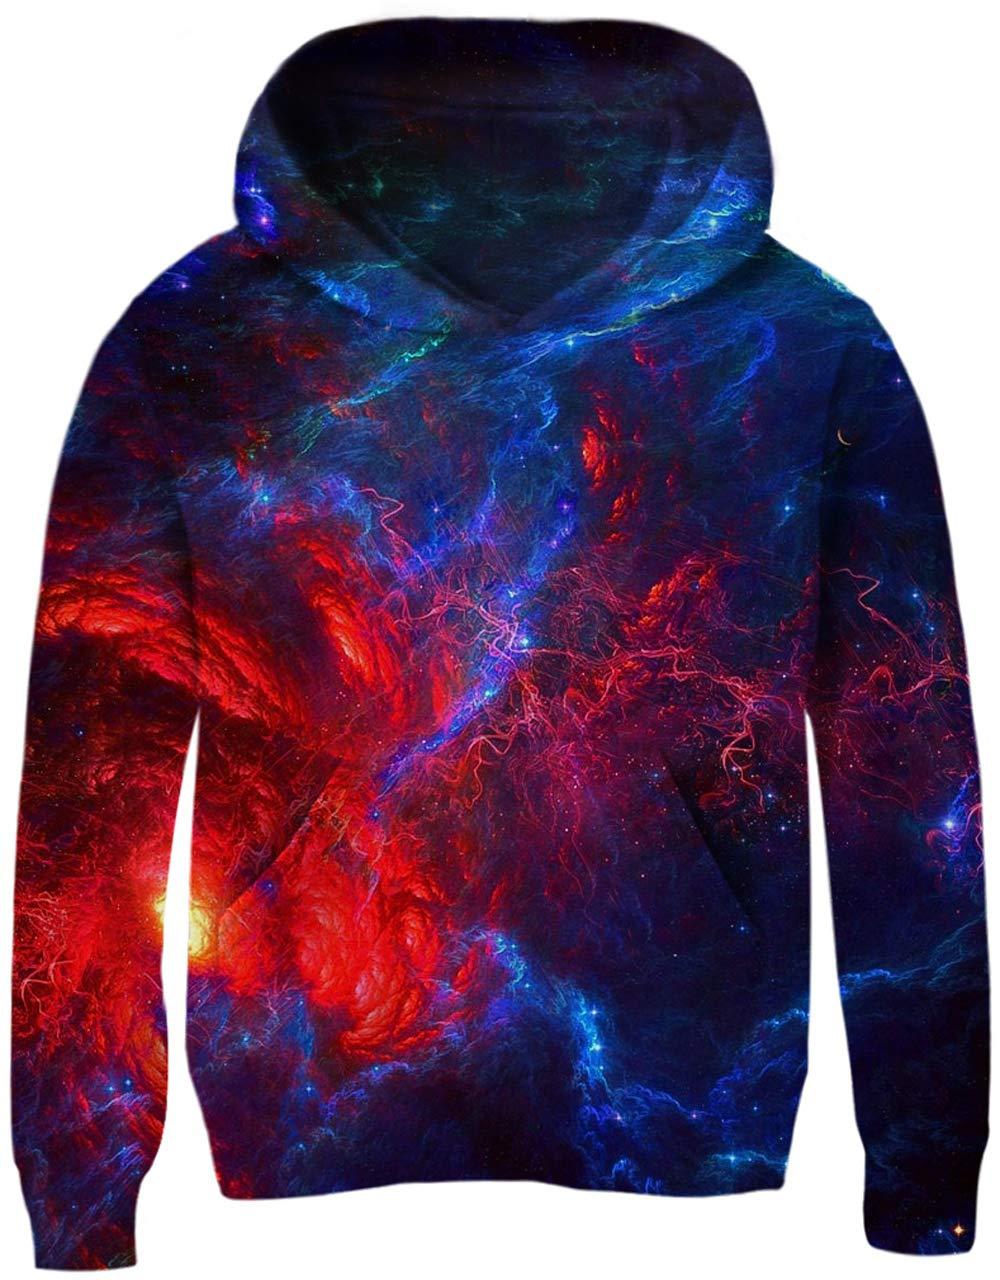 UNICOMIDEA 6-7 Years Hoodies Boys' Sweaters Colorful Purple Starry Sky 3D Printed Pullover Cool Blue Sweatshirts Tie Dye Hoodies with Big Pocket L